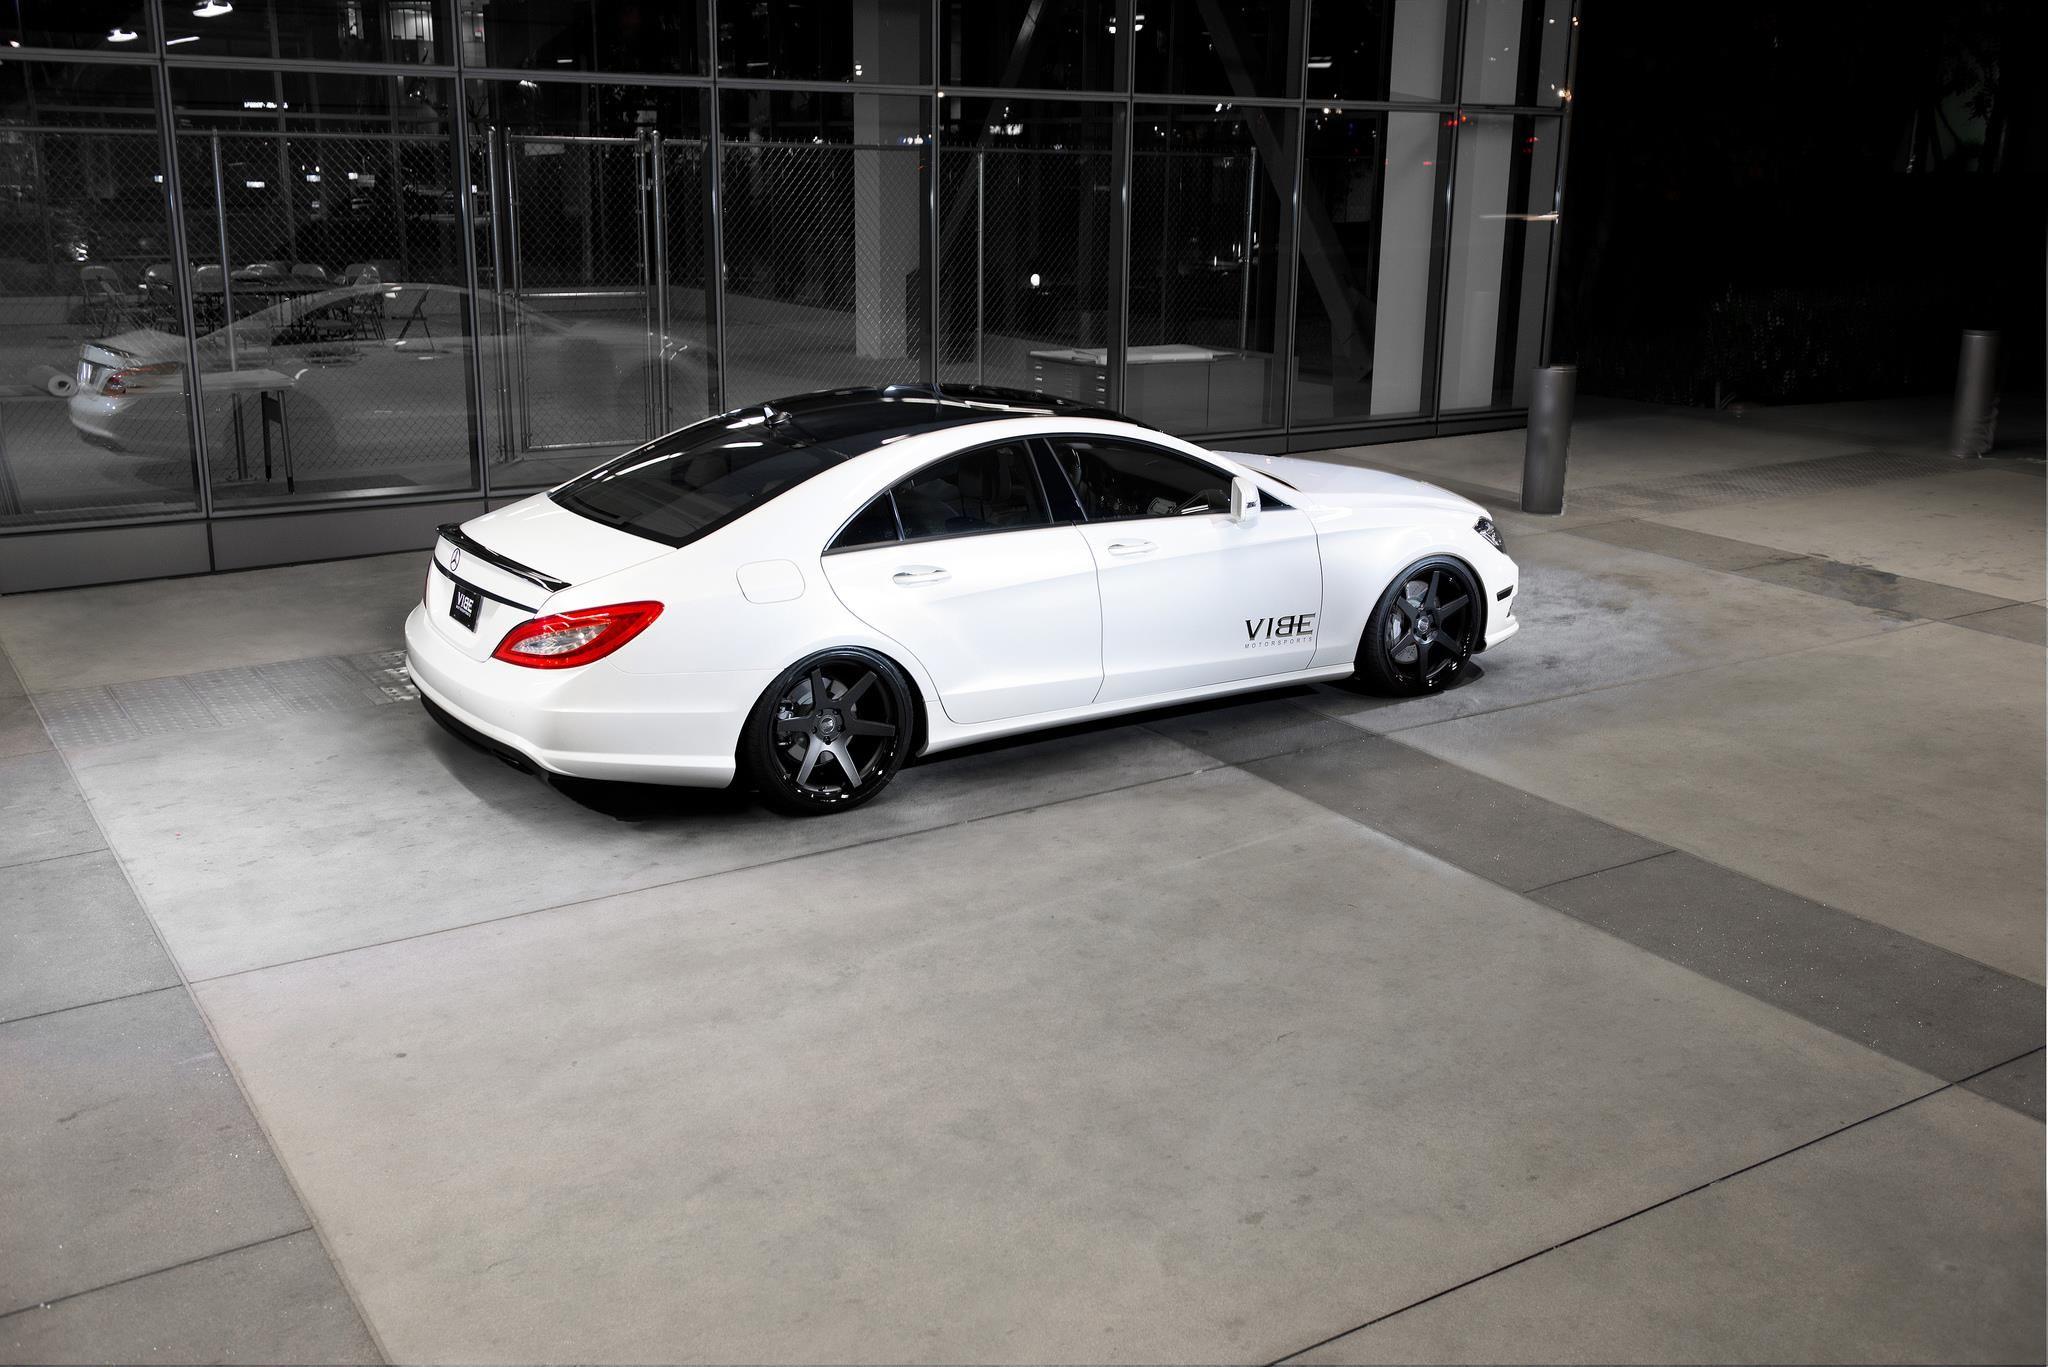 Mercedes Cls550 On 20 Concept One Cs6 0 Vibe Motorsports Photo 11615 Mercedes Cls550 Custom Mercedes Benz Mercedes Benz Models